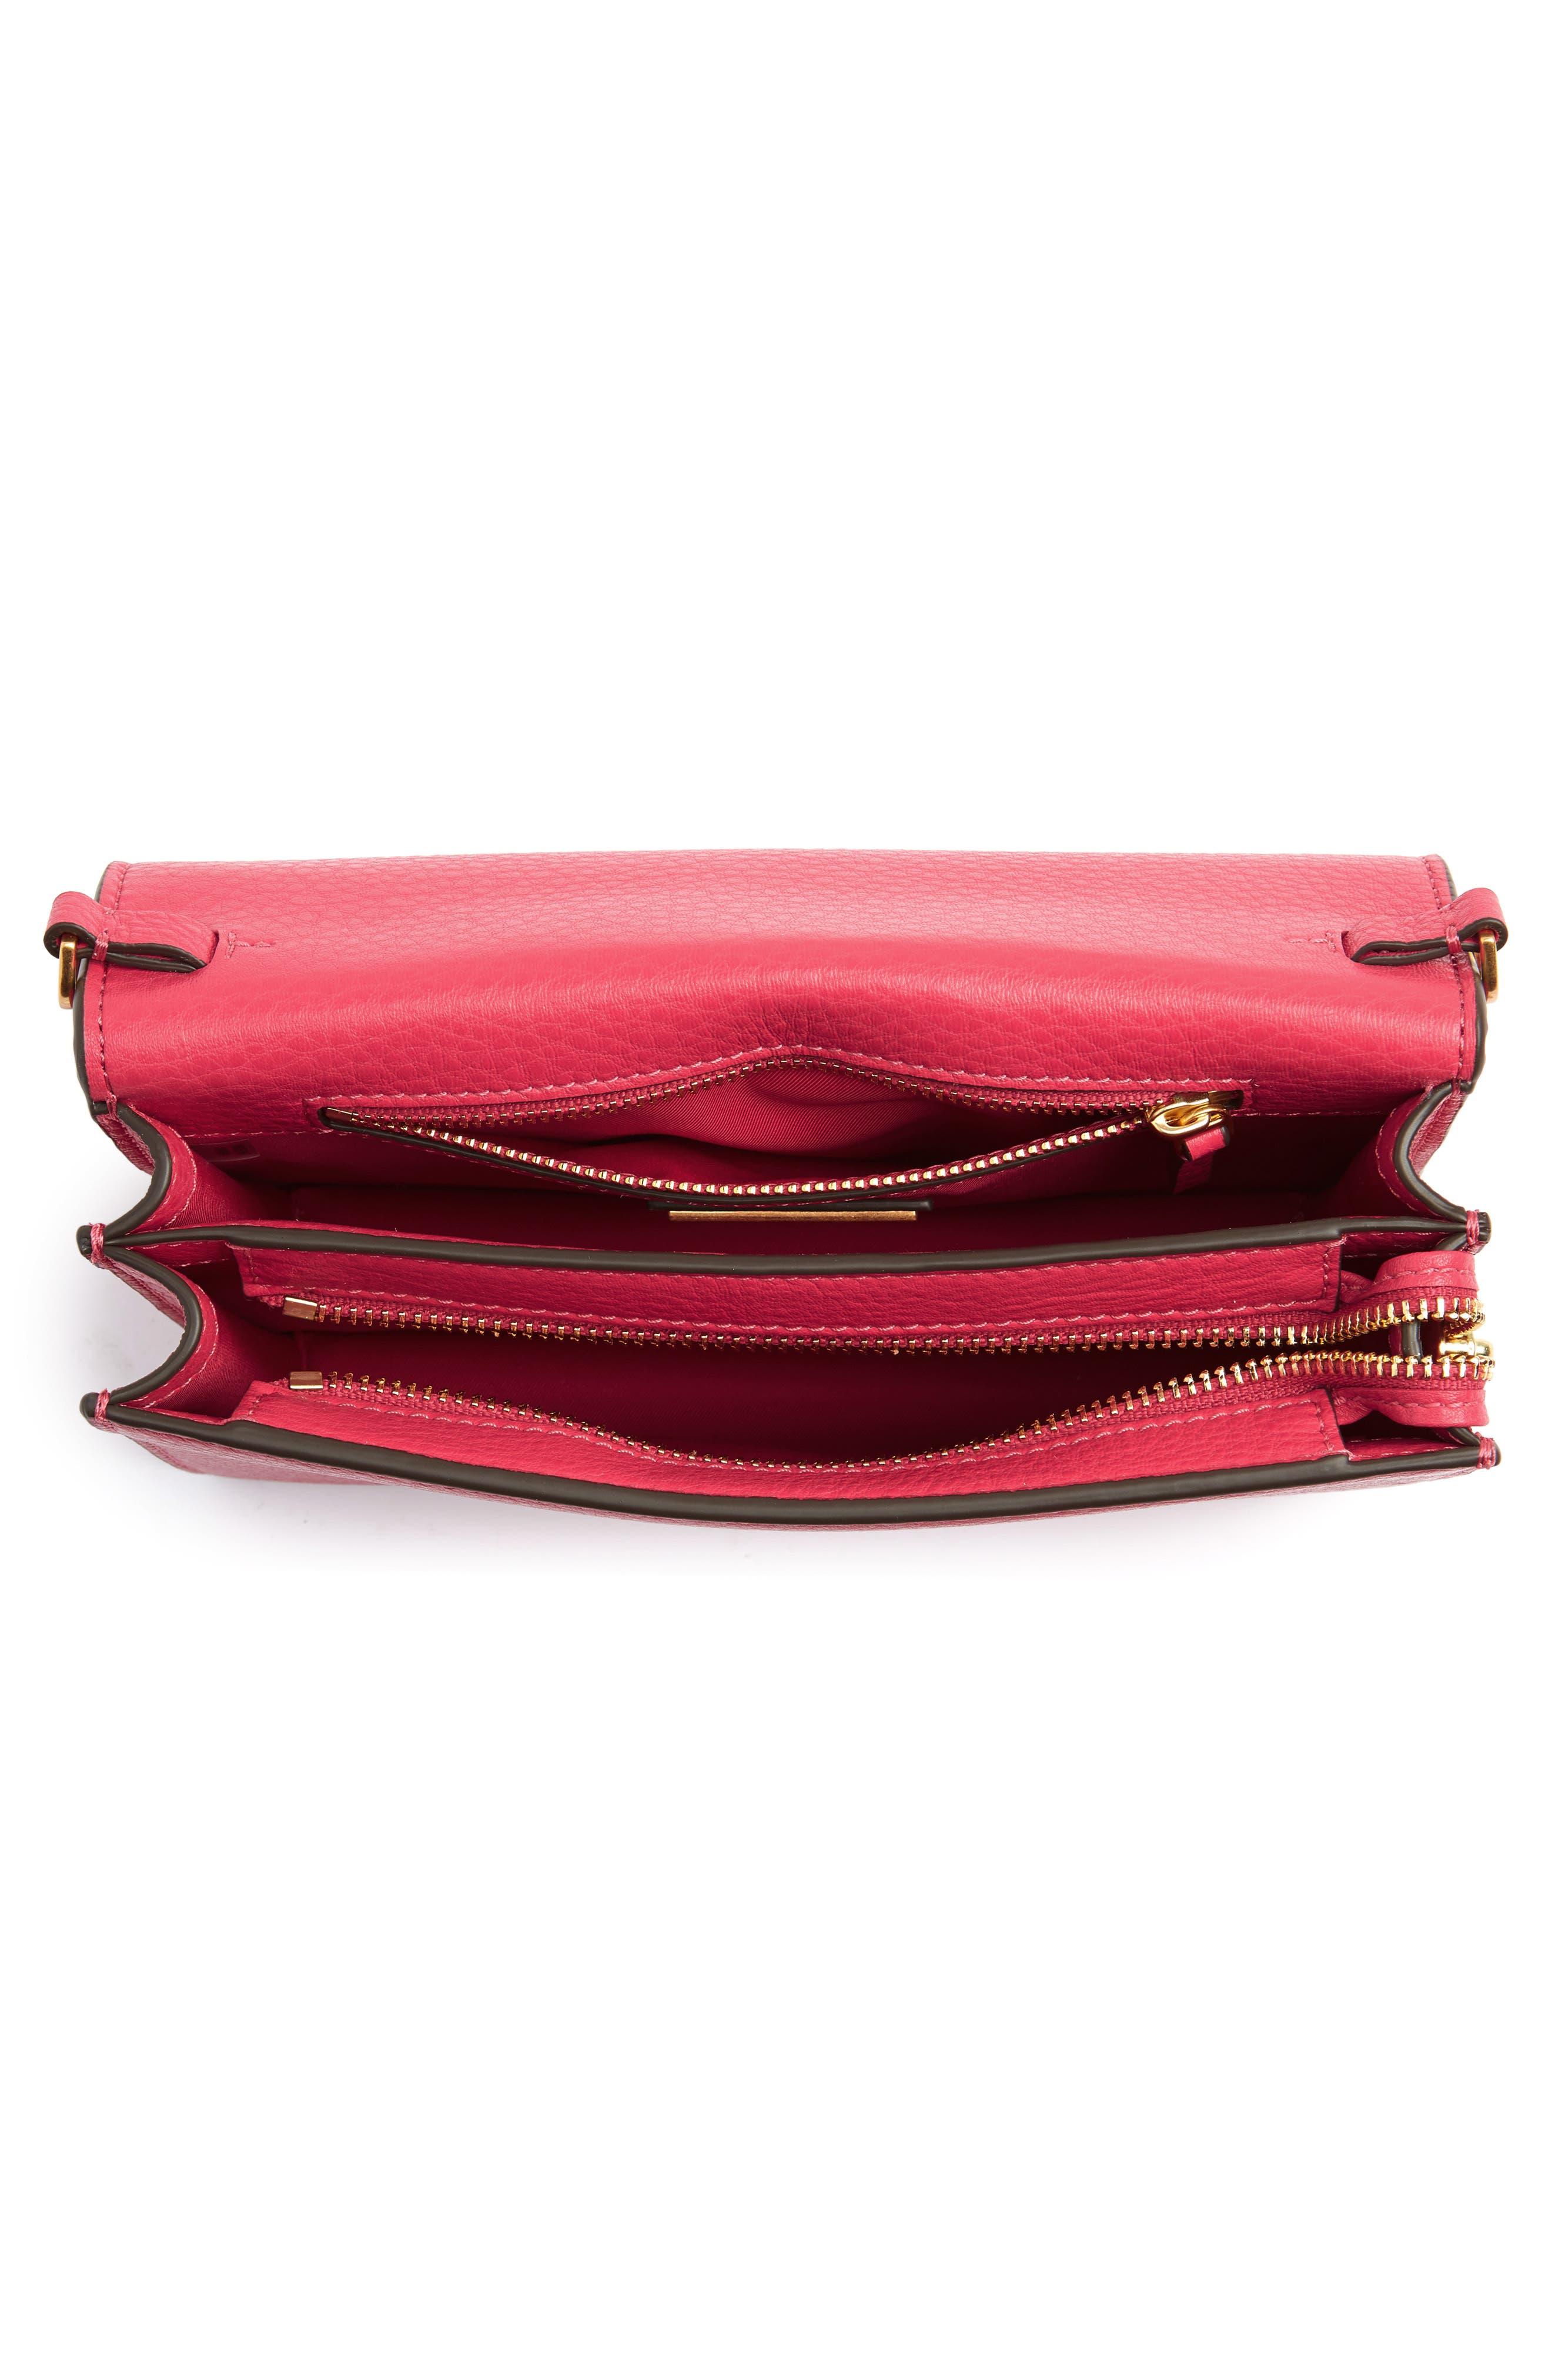 Georgia Pebble Leather Shoulder Bag,                             Alternate thumbnail 6, color,                             Bright Azalea